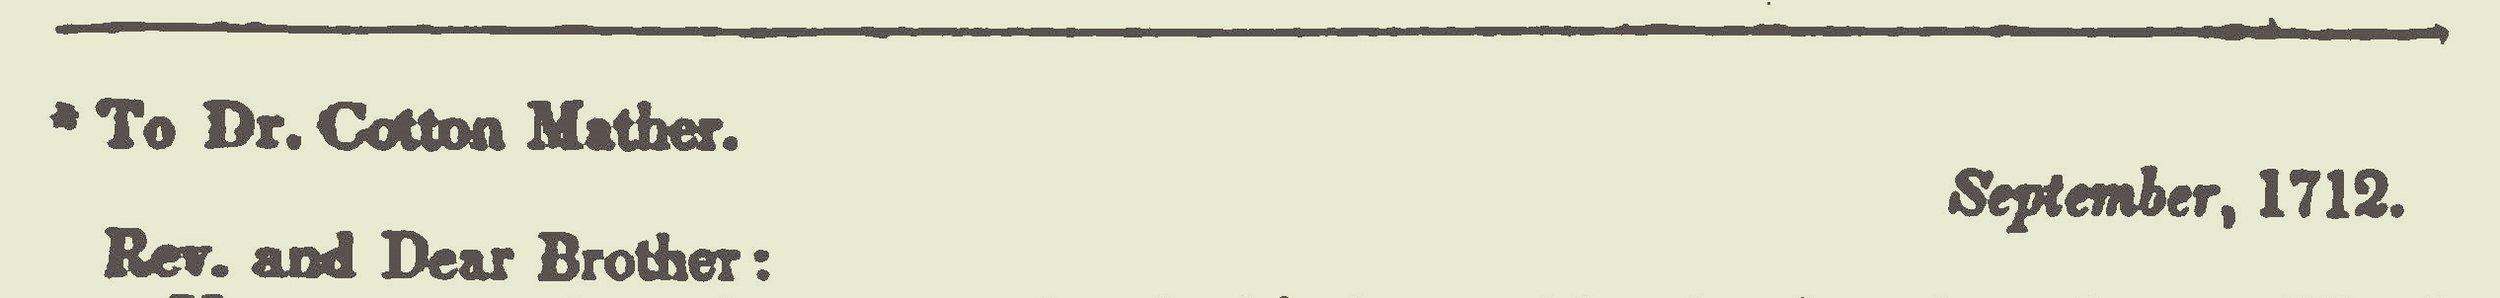 Hampton, John, 1712 Letter to Cotton Mather Title Page.jpg